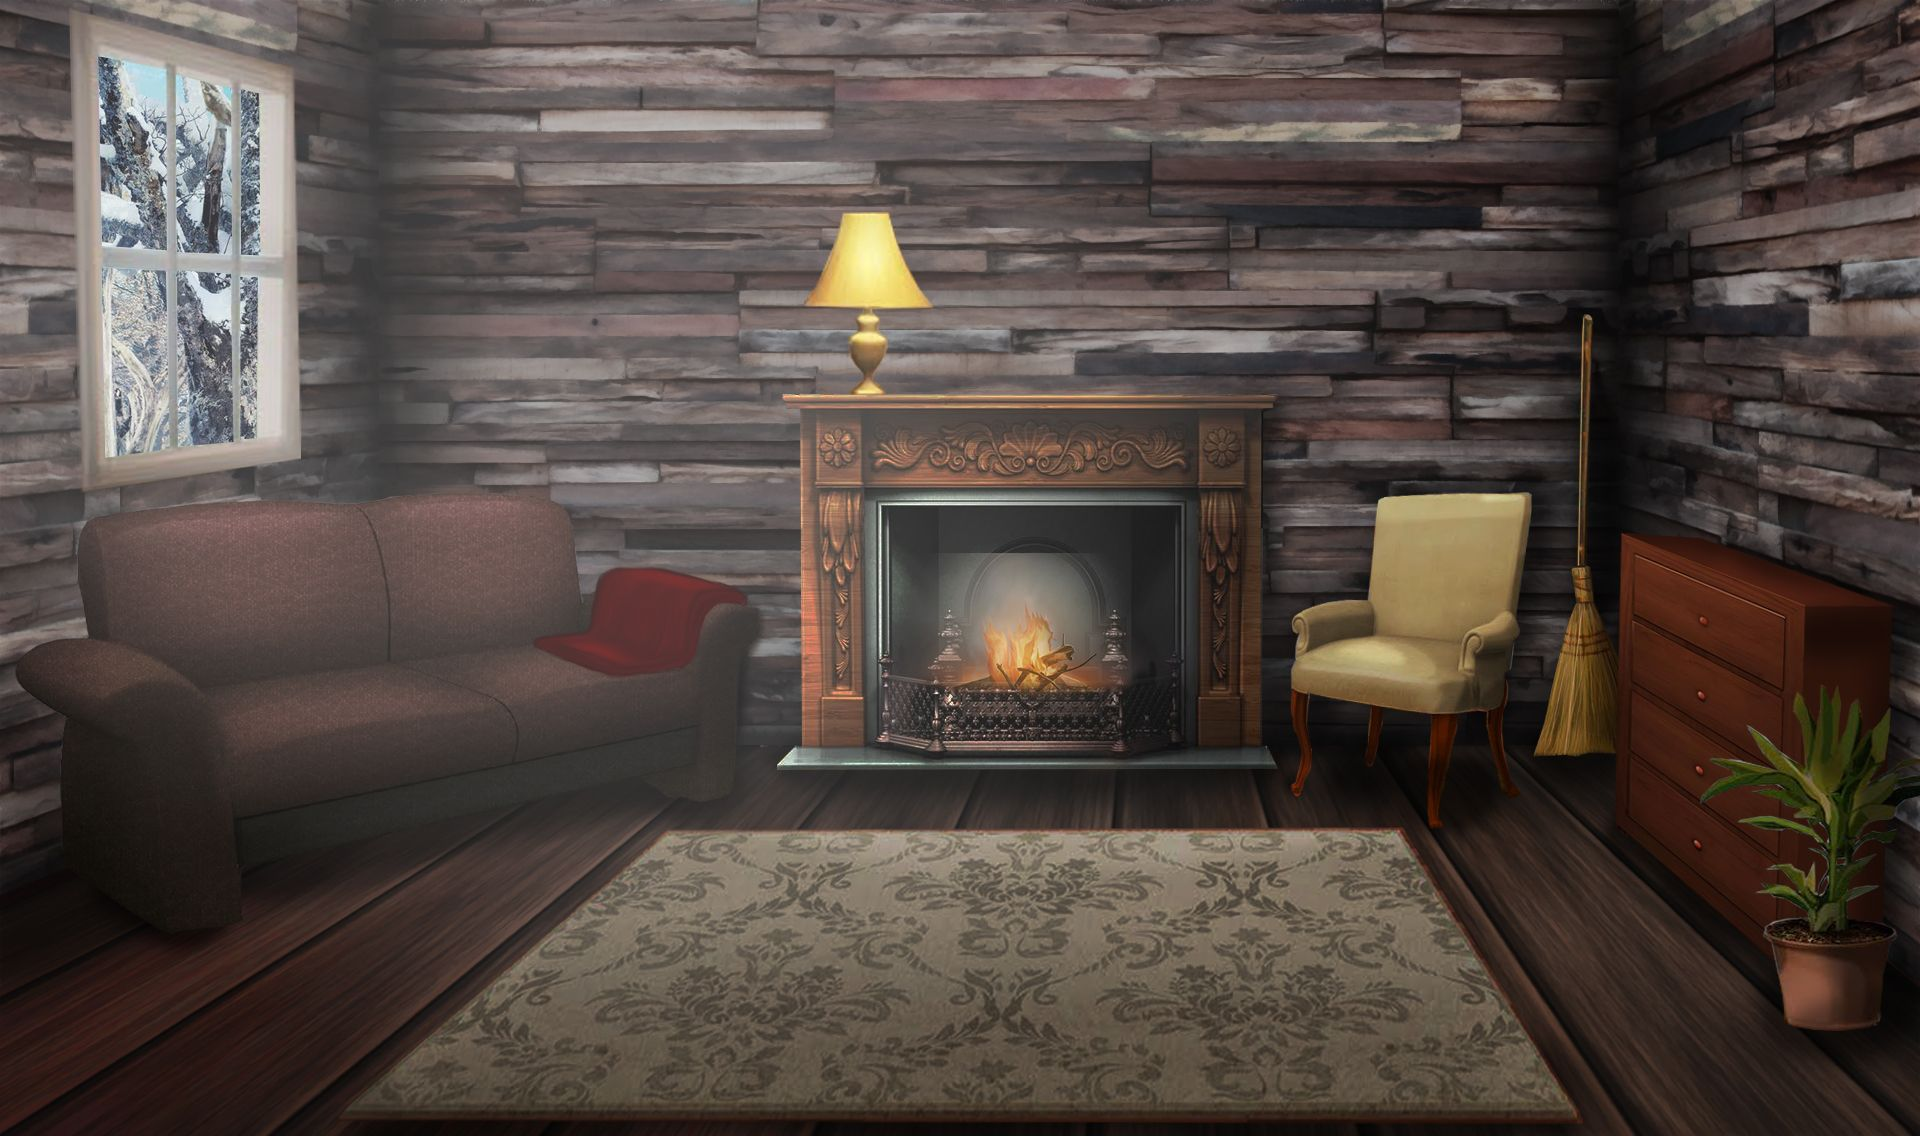 Living Room Episode Backgrounds Episode Interactive Backgrounds